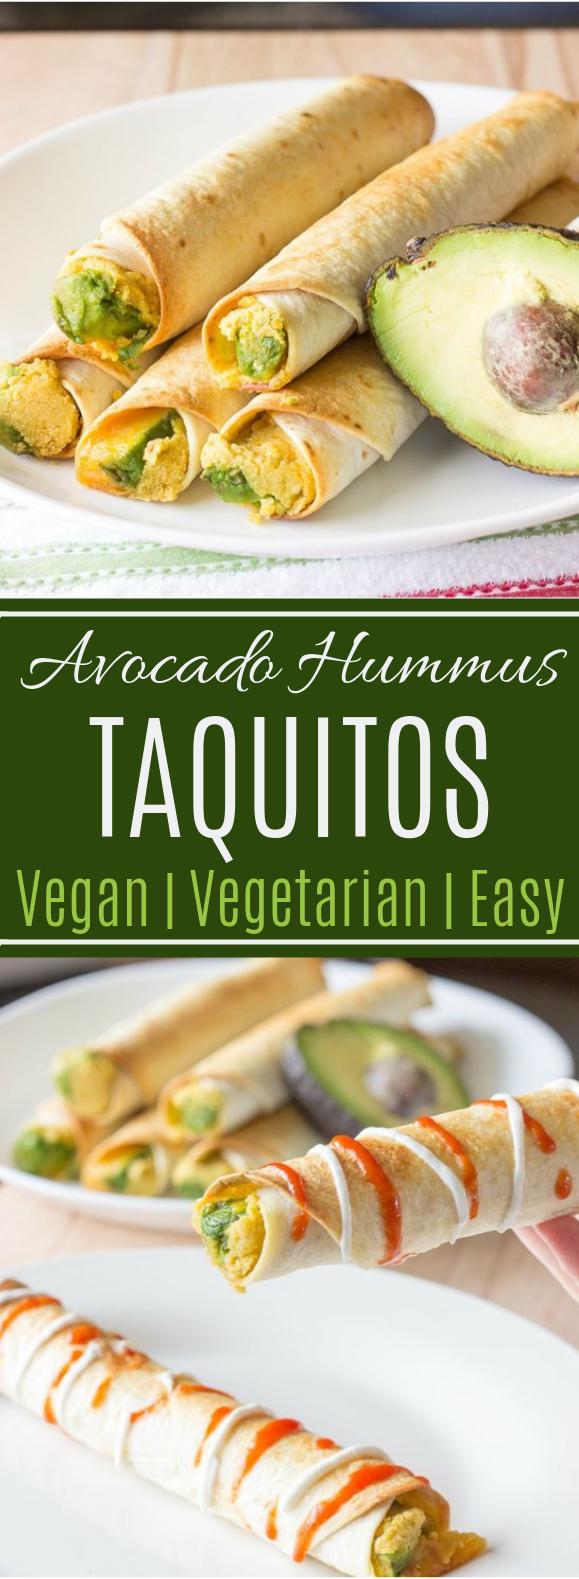 Avocado Hummus Taquitos #lunch #veganmeal